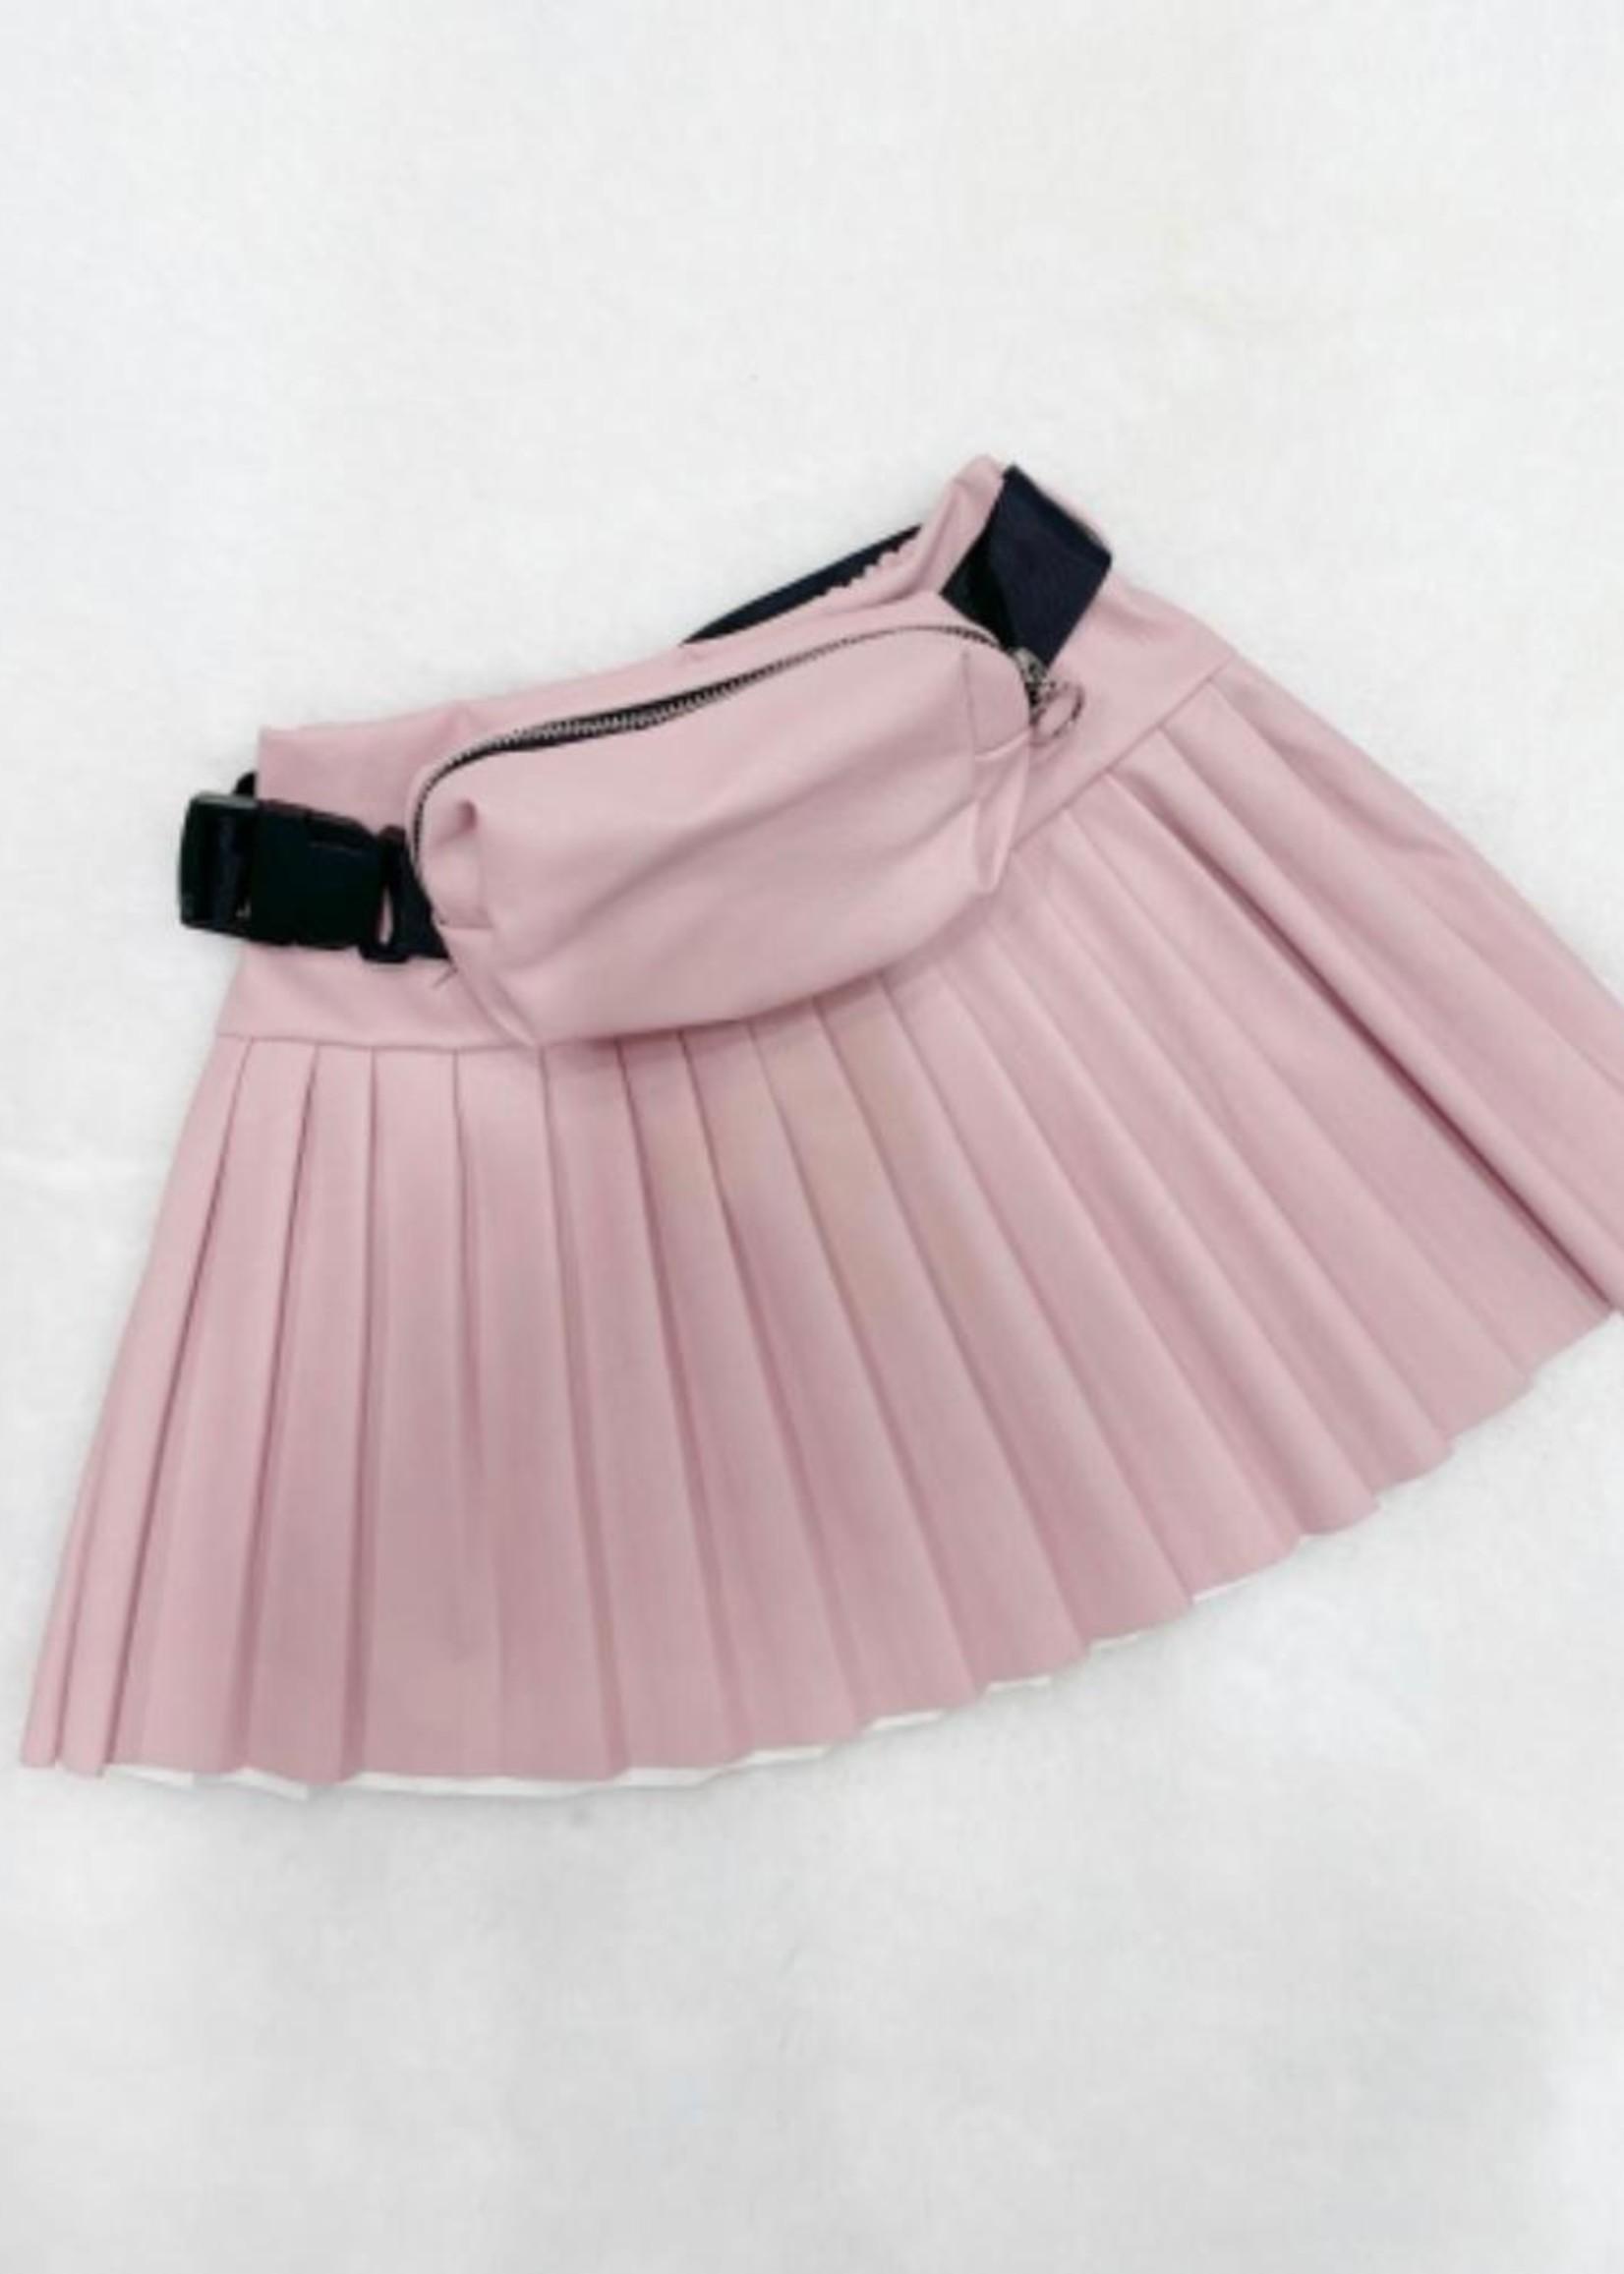 Divanis Divanis leatherskirt pink met tasje